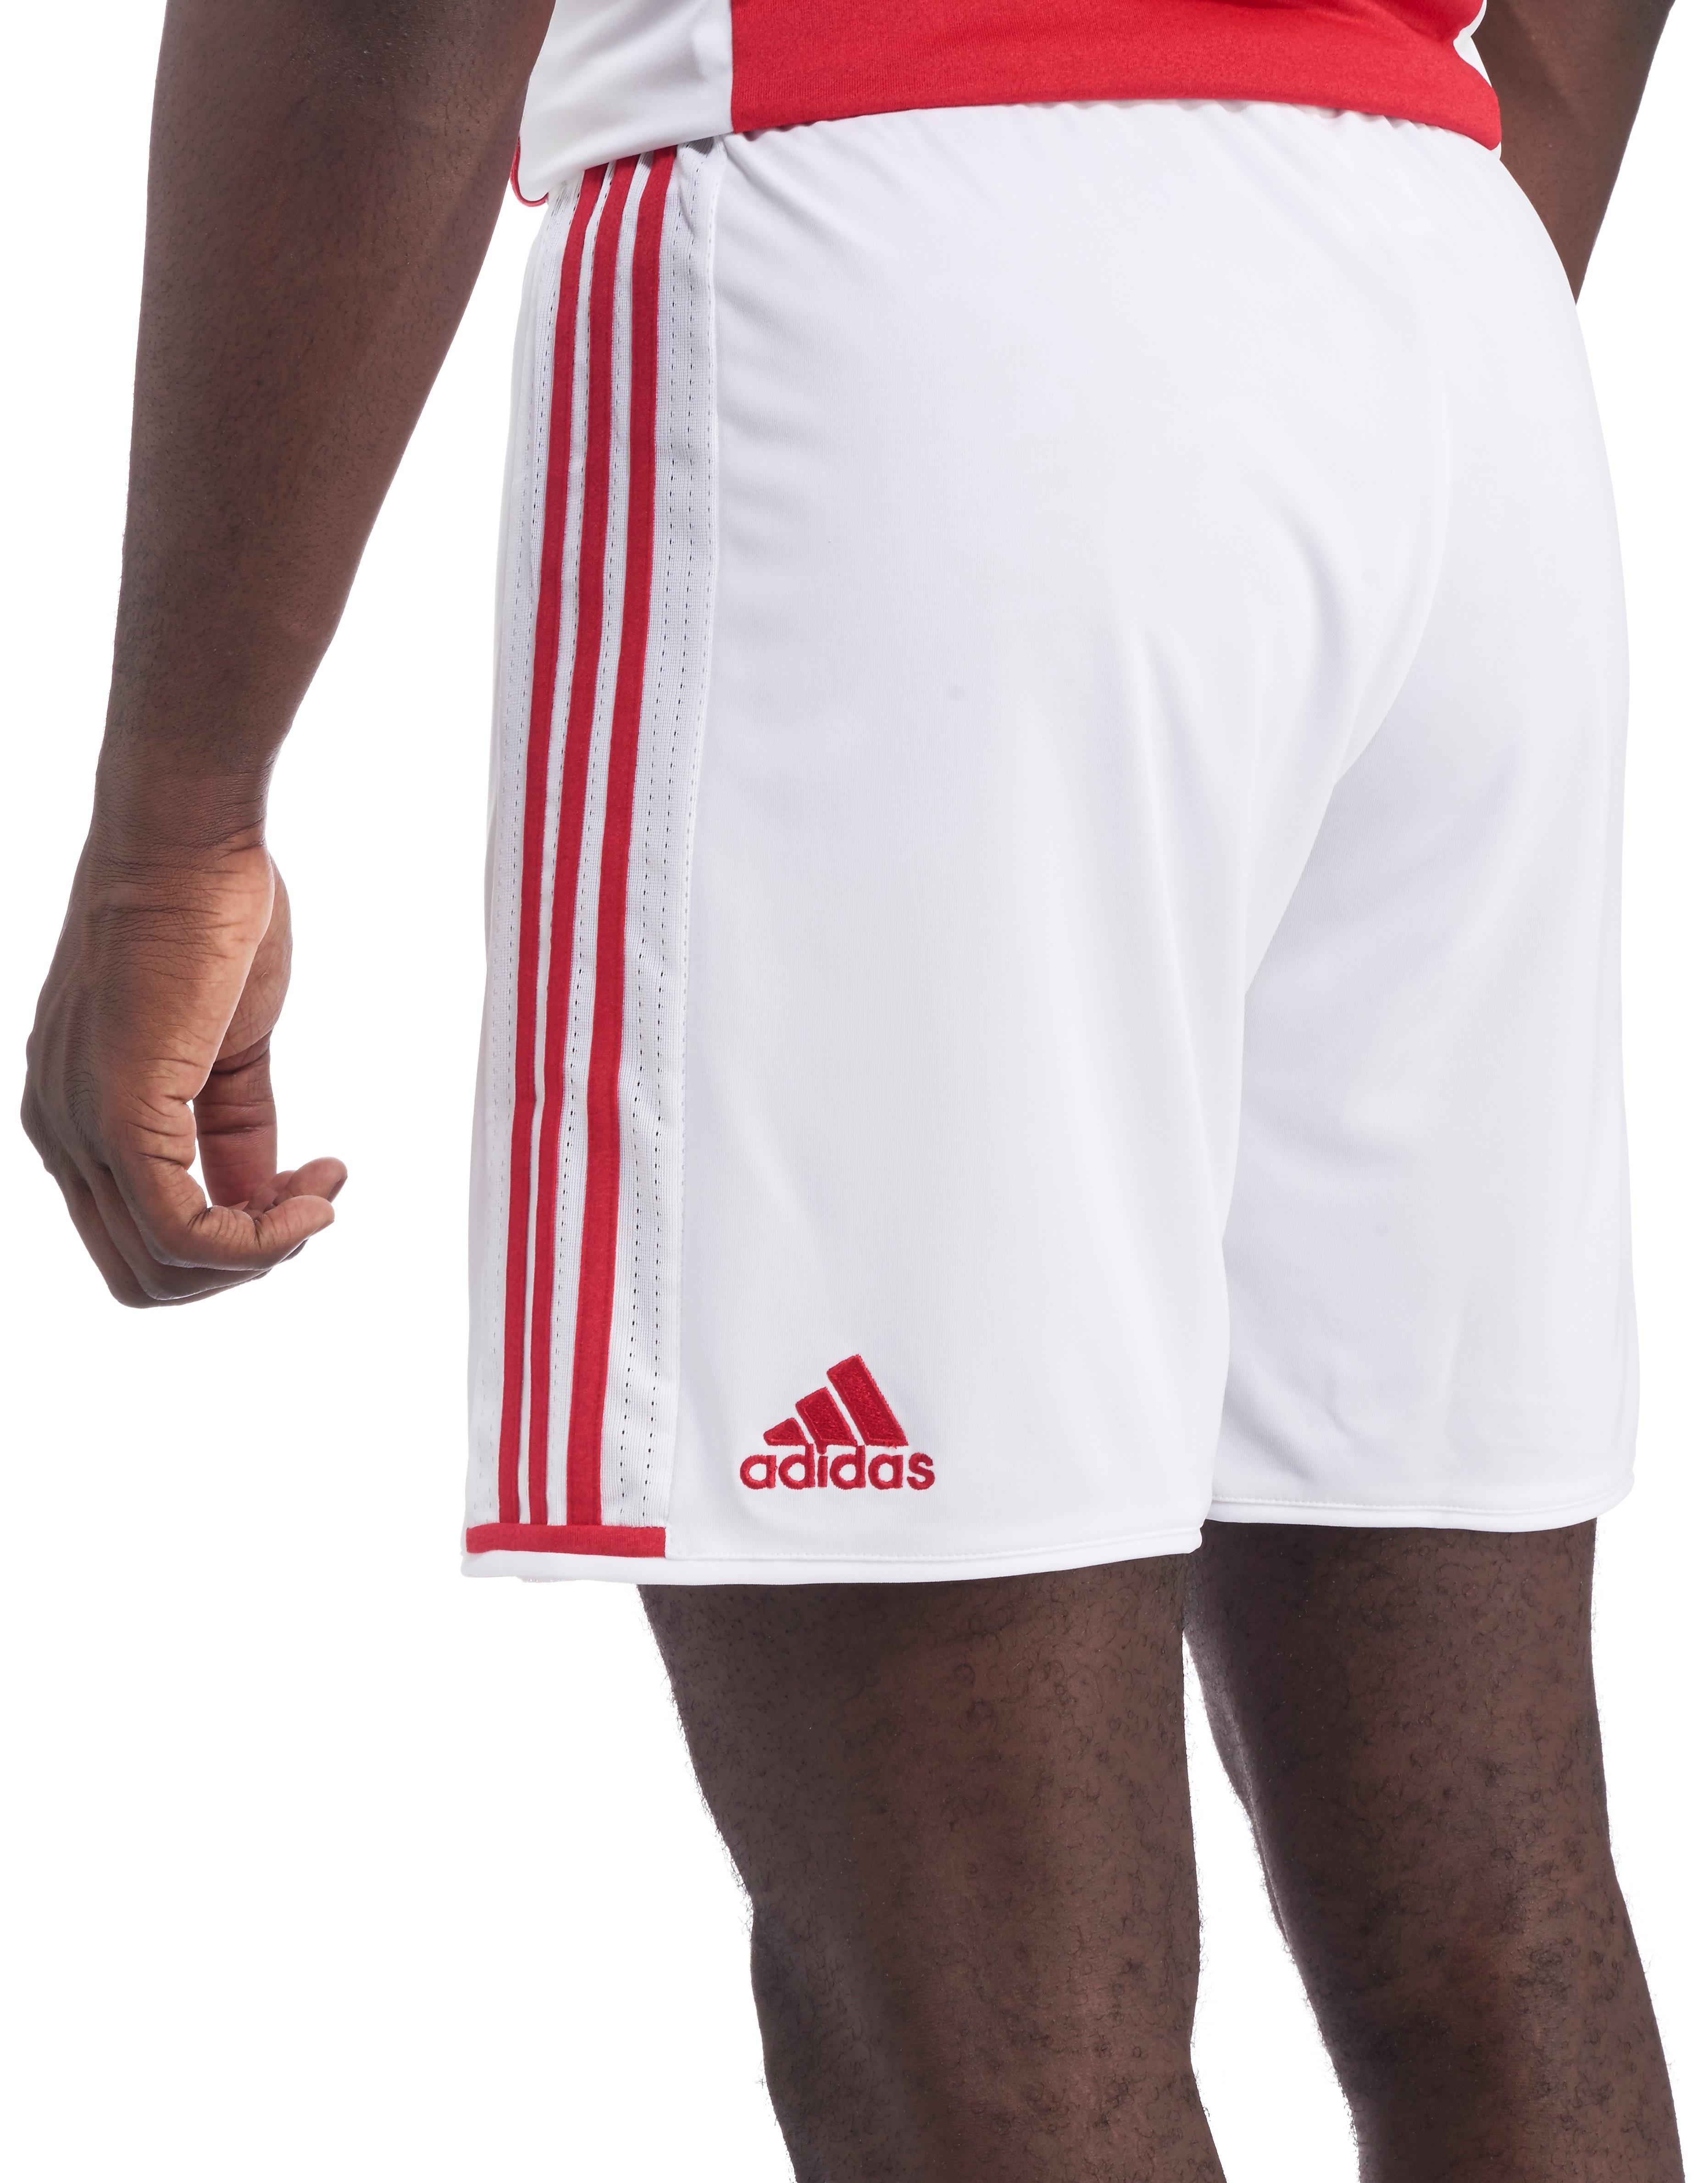 adidas Ajax 2016/17 Home Shorts